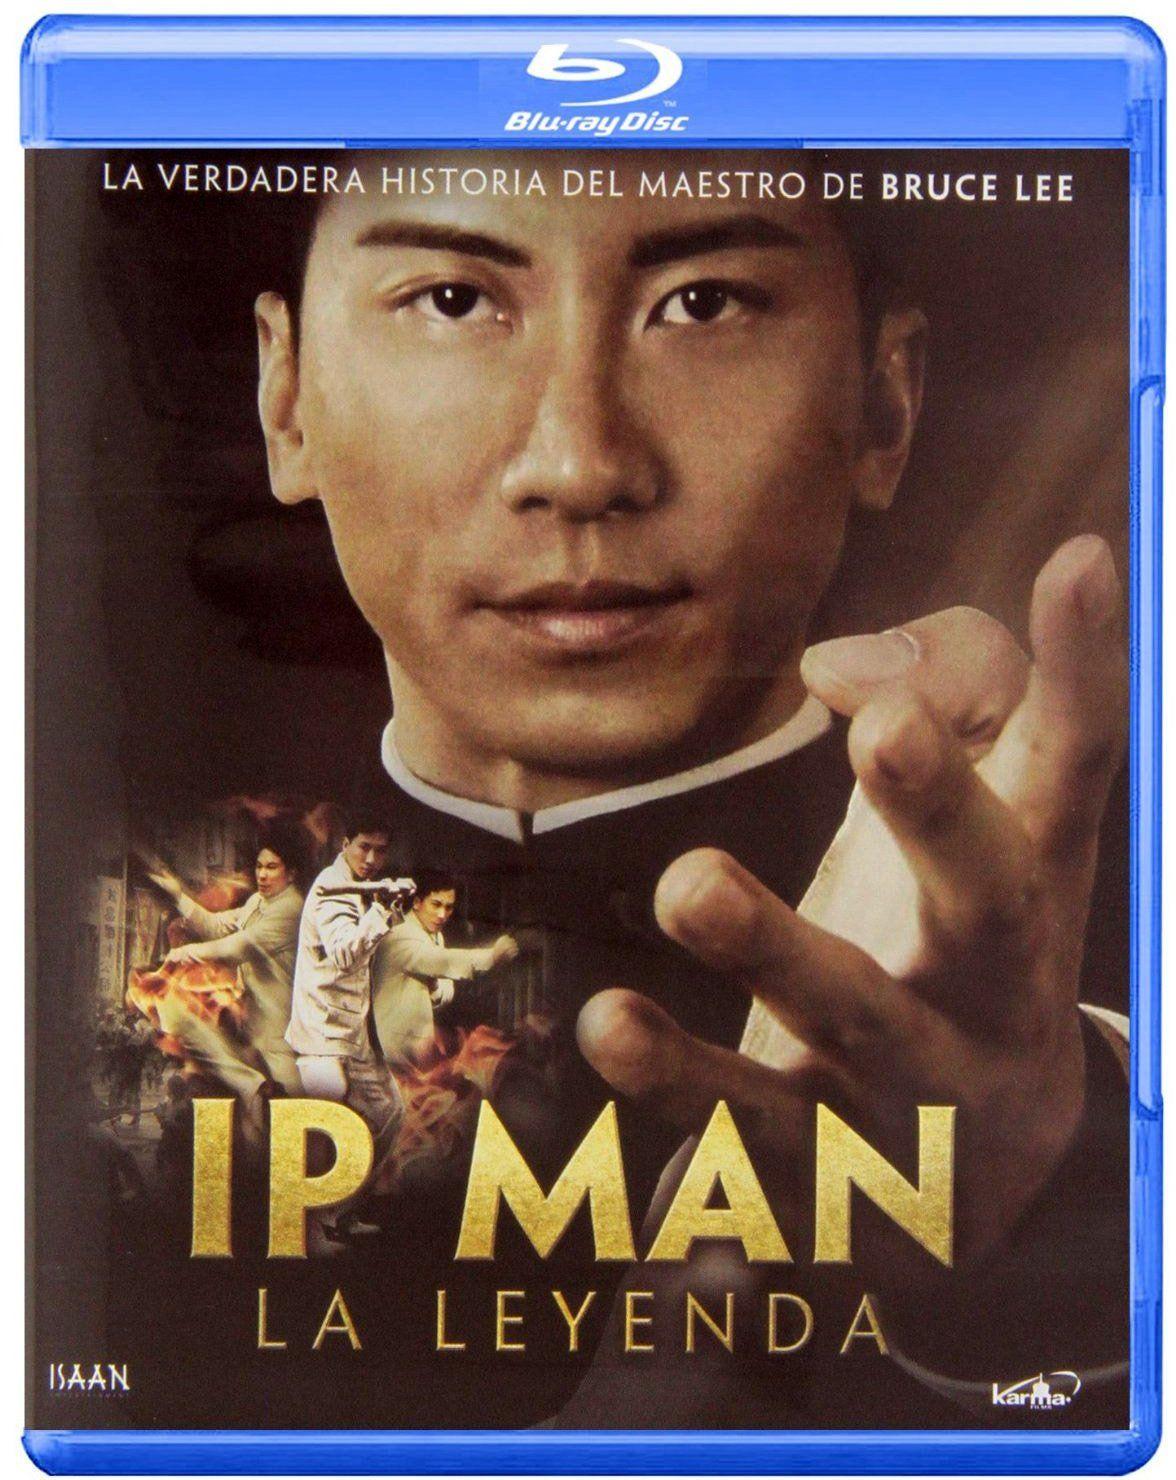 Hispania La Leyenda Full Movie ip man: la leyenda [blu-ray] #la, #man, #ip, #ray   móviles